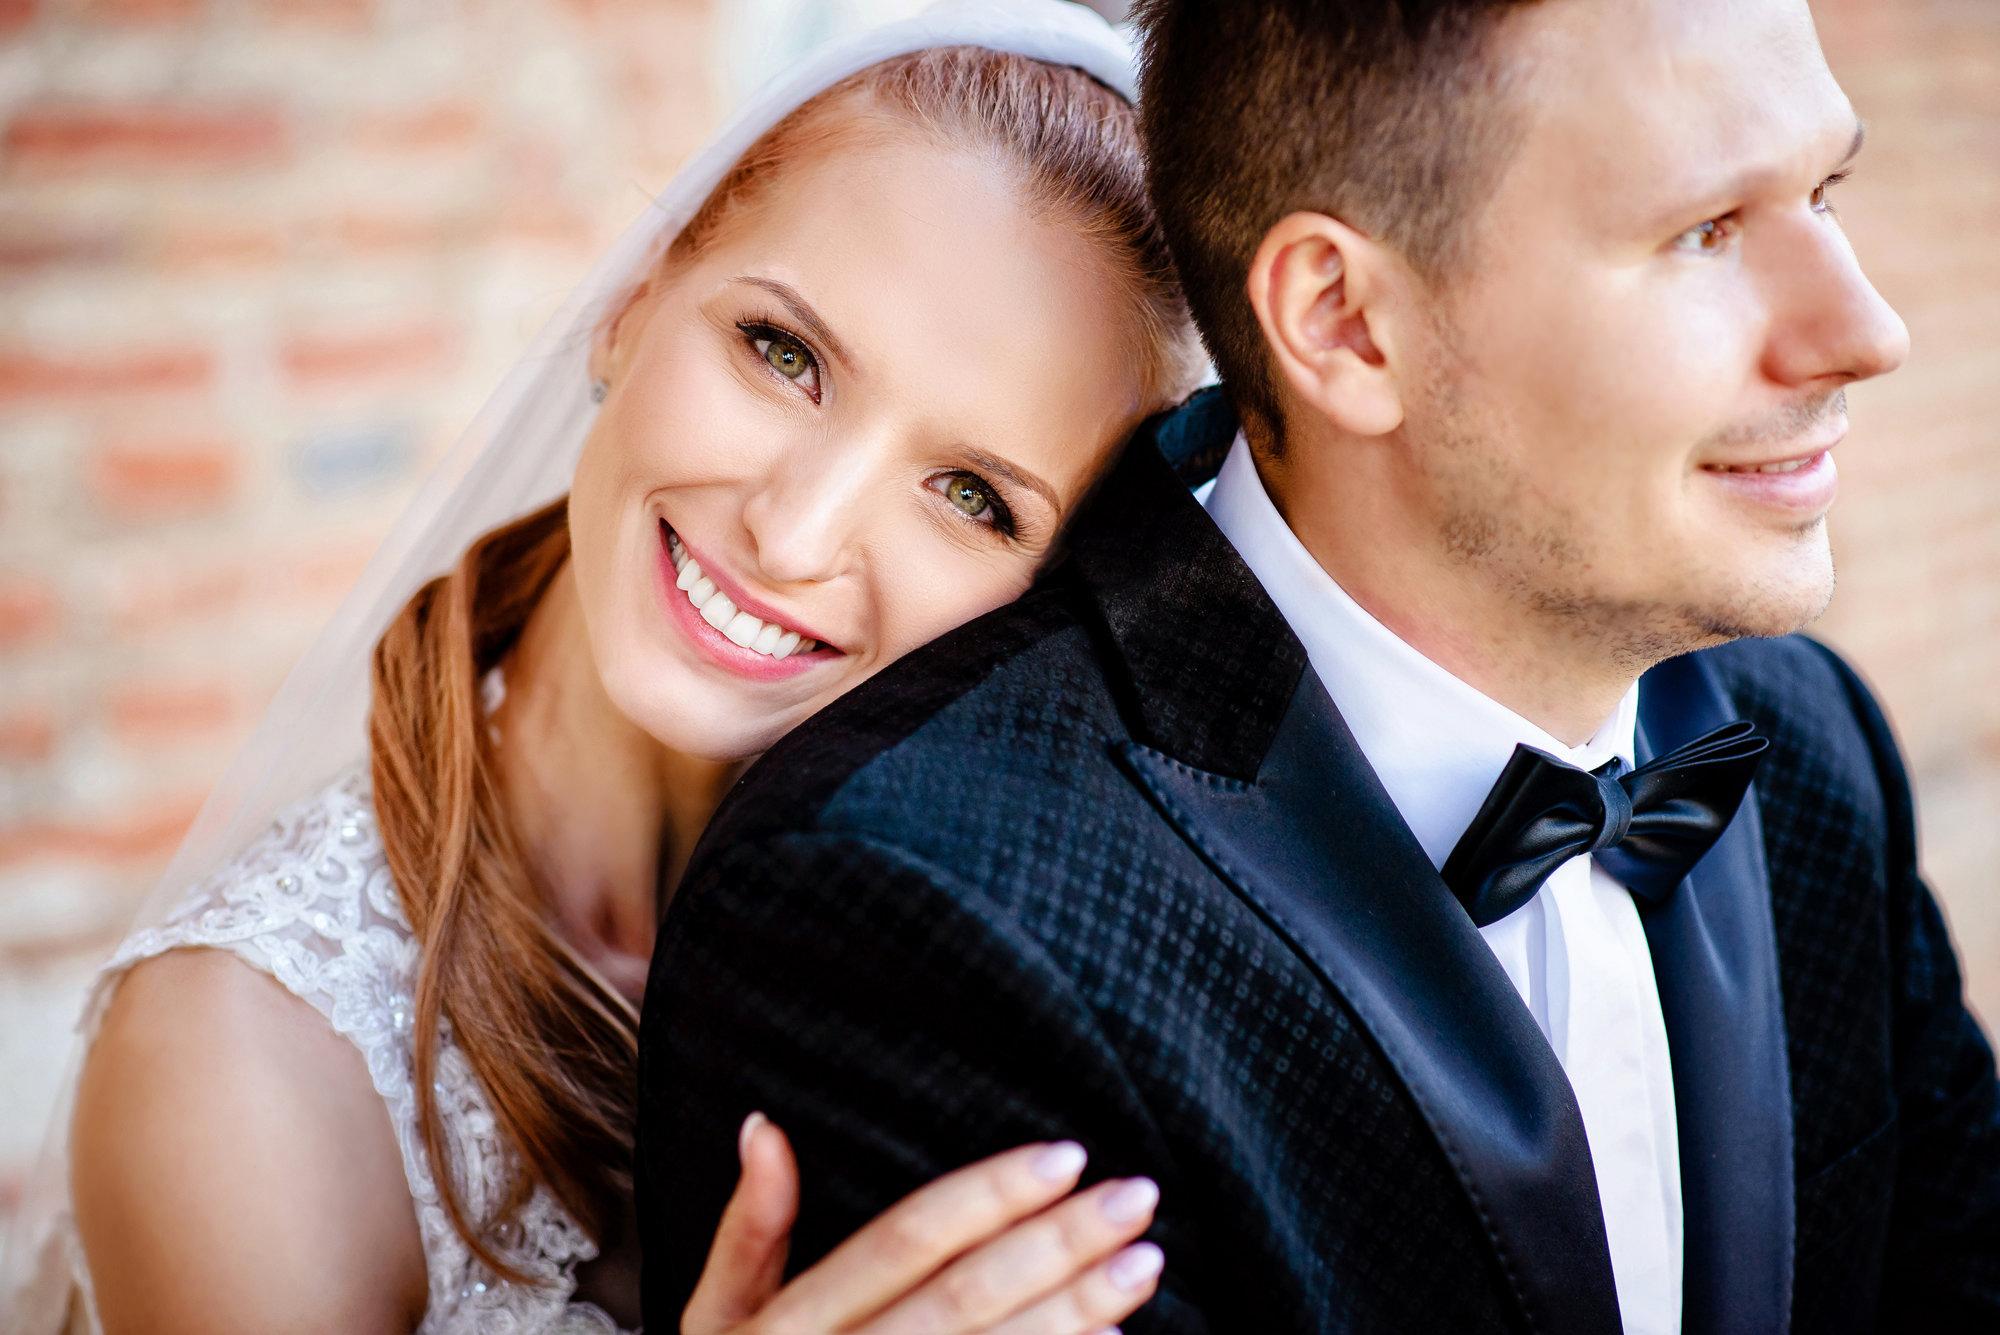 alexandru madalina wedding day 31